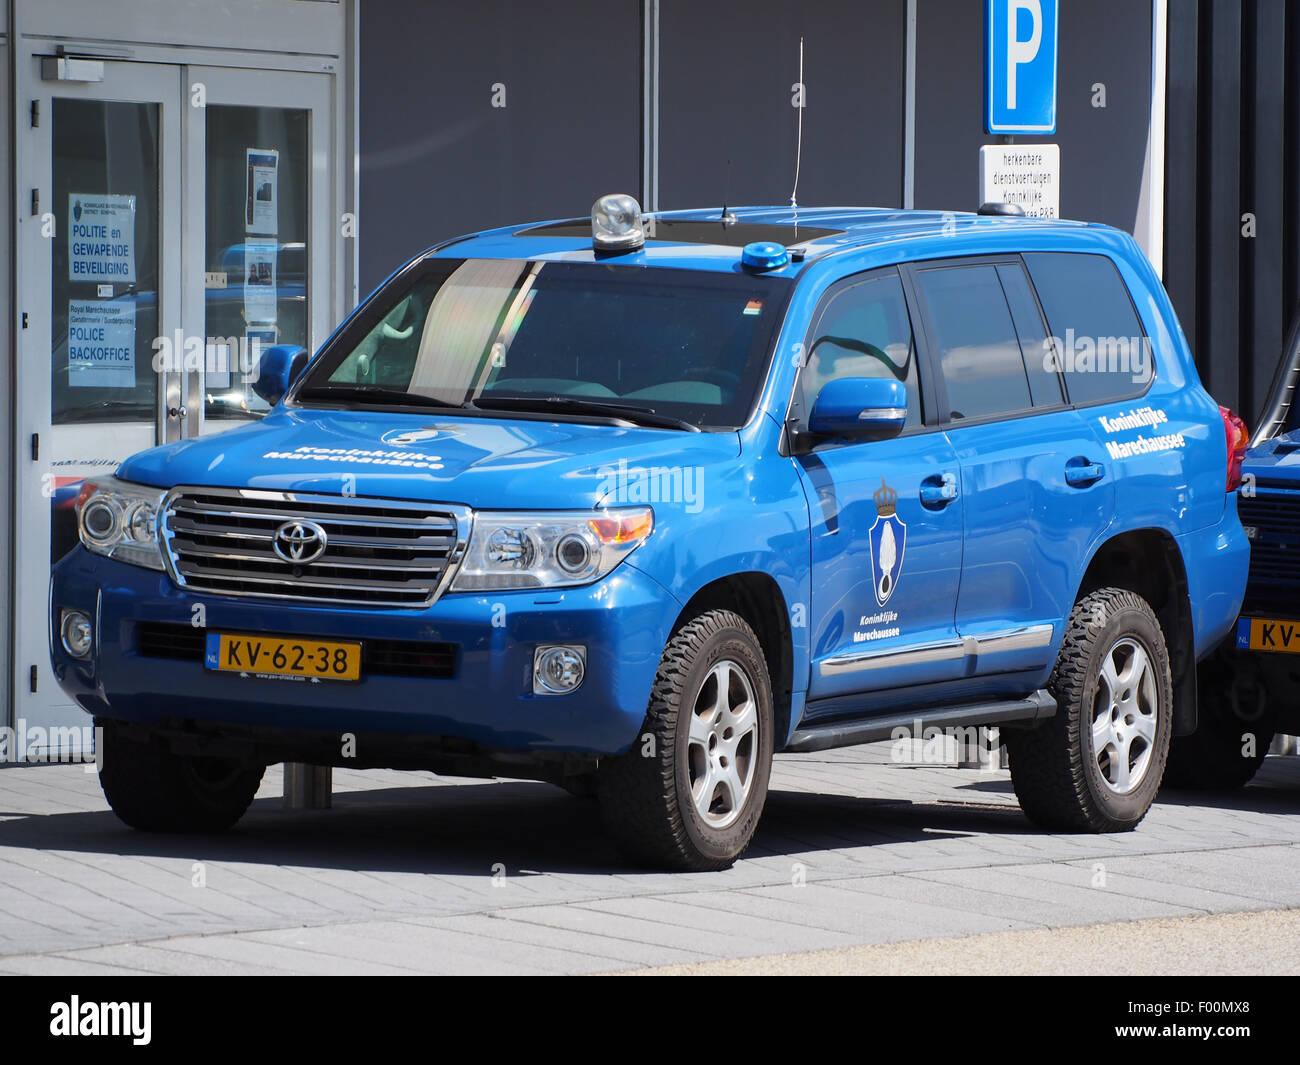 Toyota Koninklijke Marechaussee, Schiphol pic2 - Stock Image